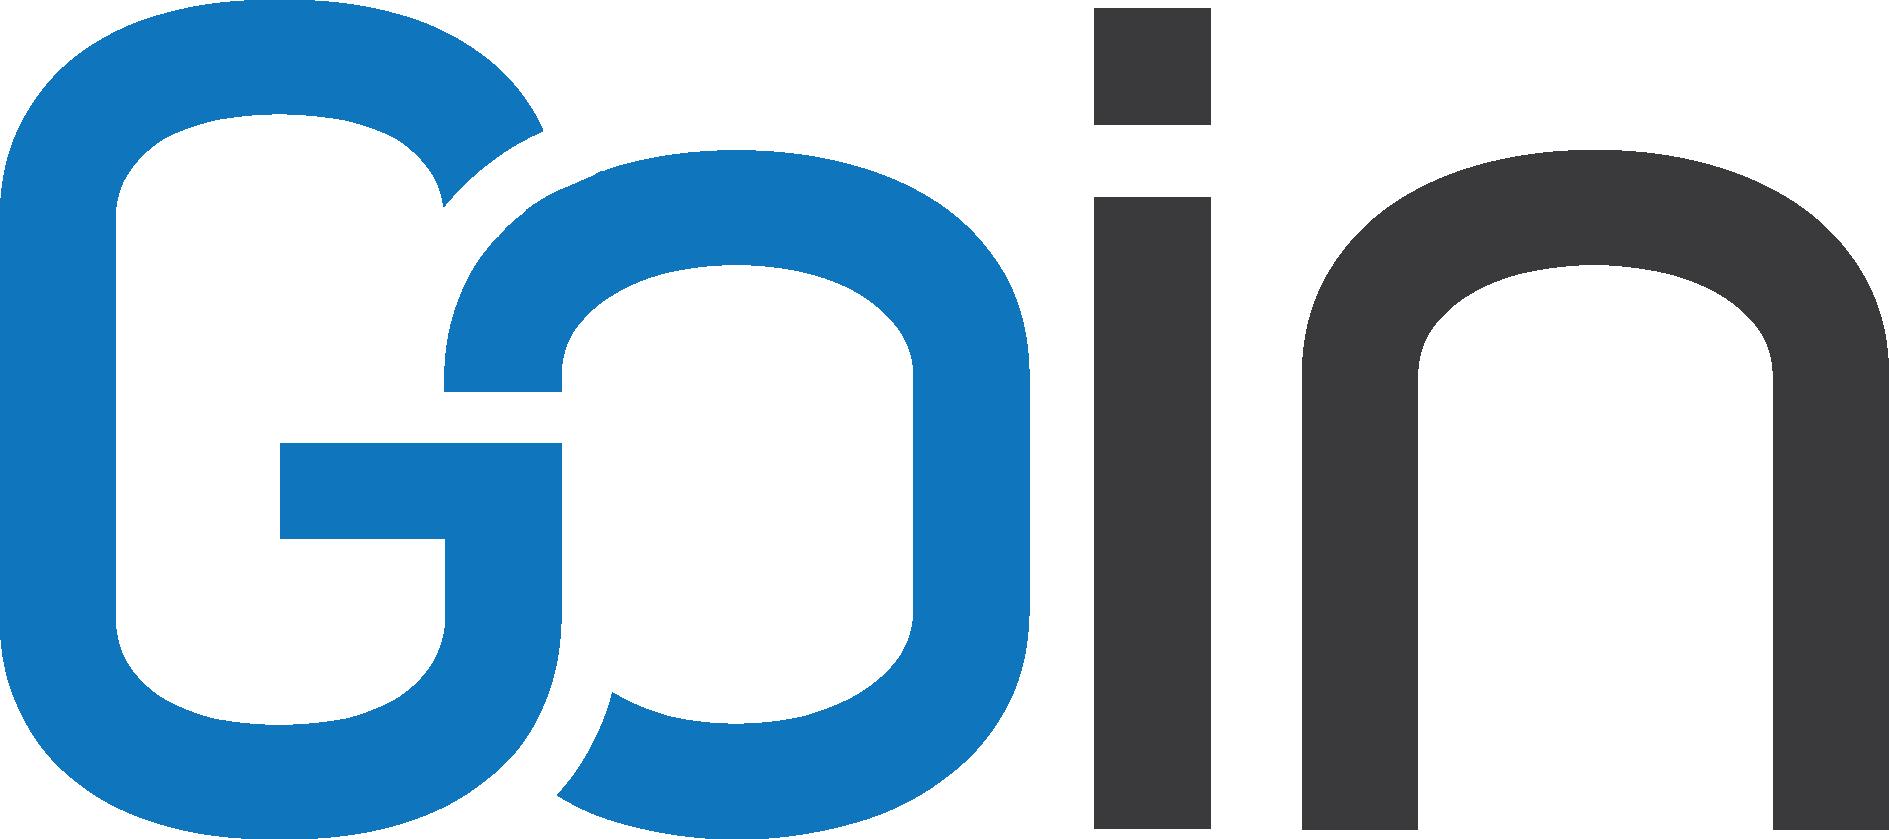 Create a logo for an innovative FinTech company